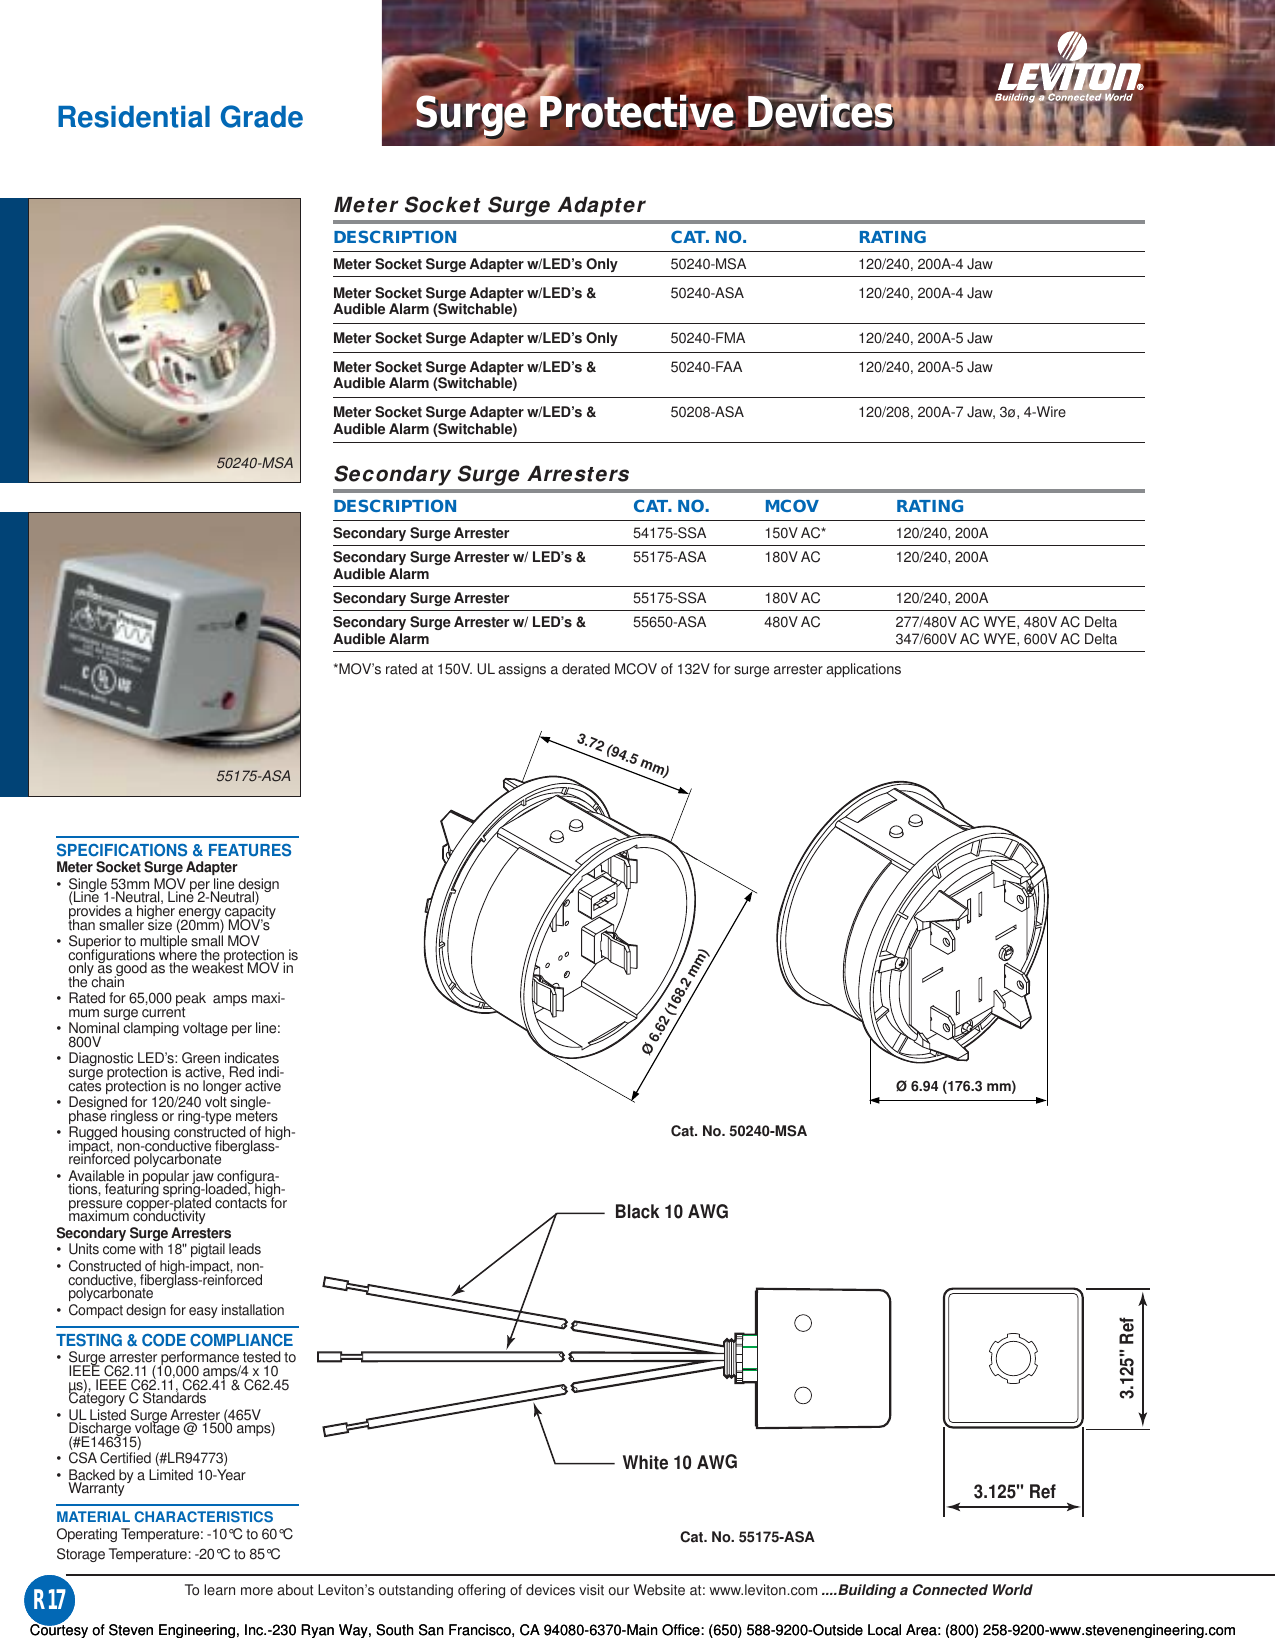 C 646 L 504 Intro/ Update 110014 Catalog Magnetek Wiring Diagram on